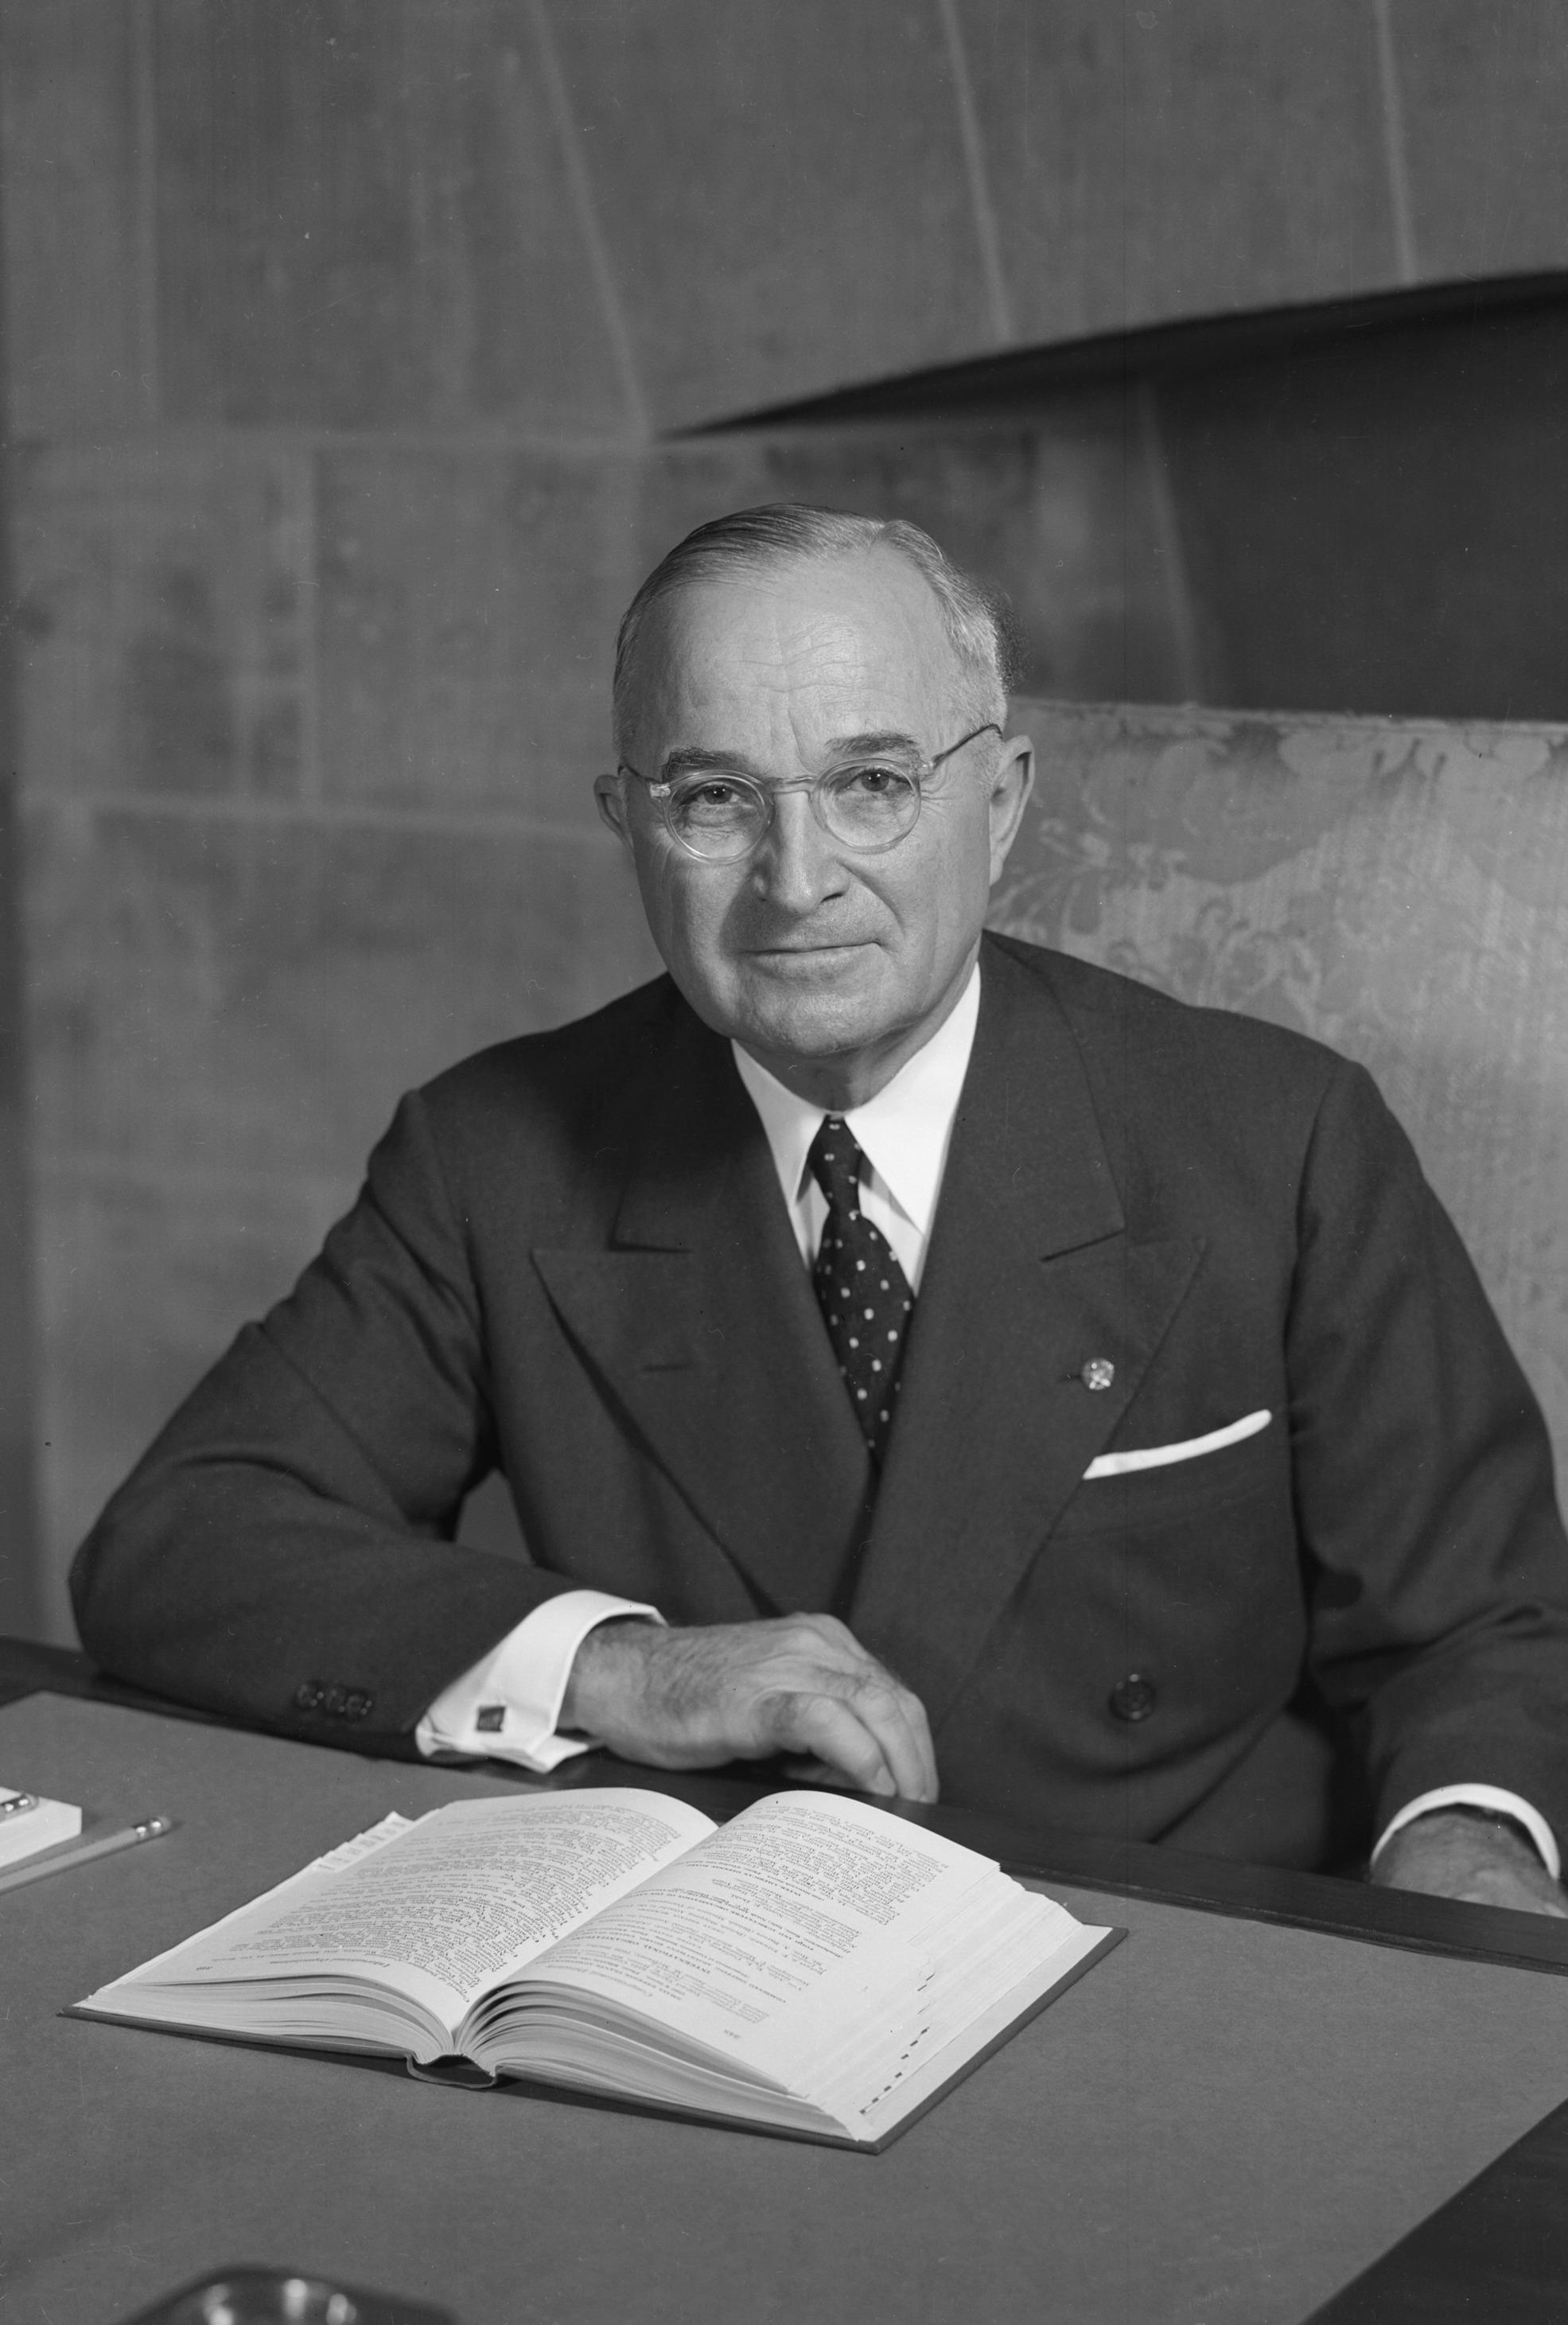 Harry S. Truman Portrait.